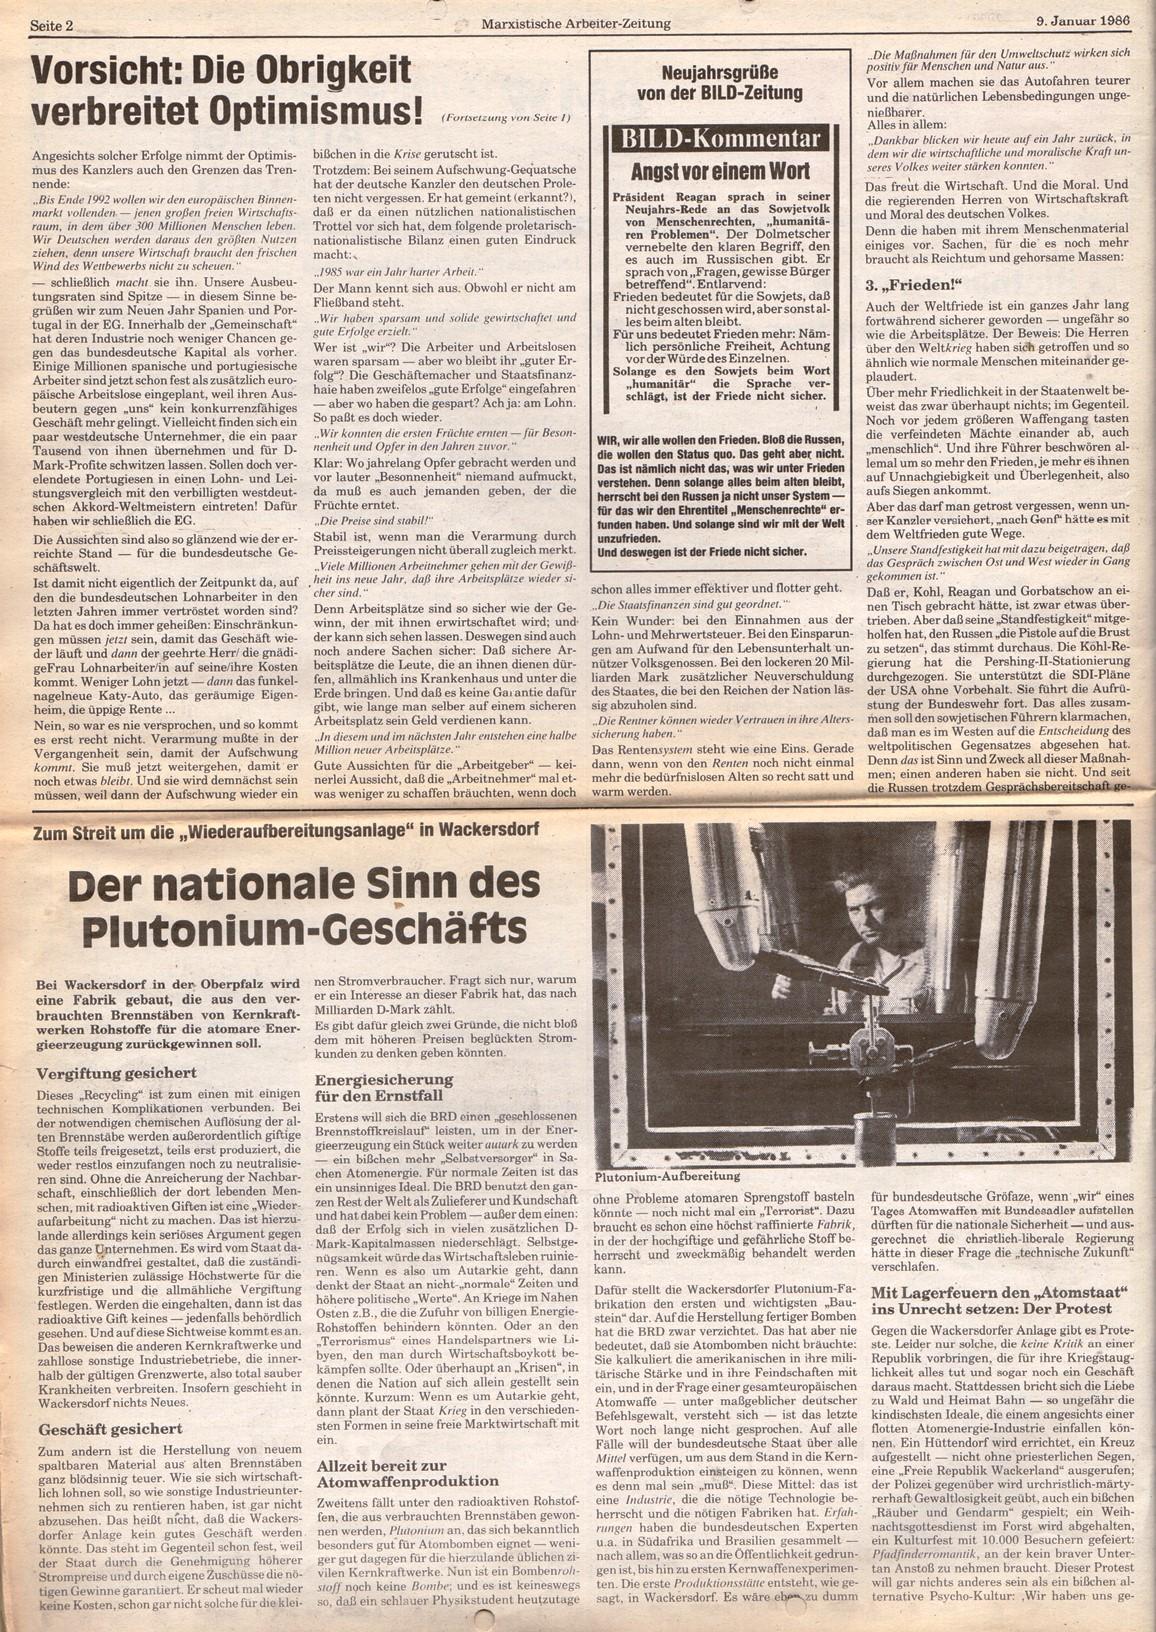 Muenchen_MG_MAZ_BMW_19860109_02